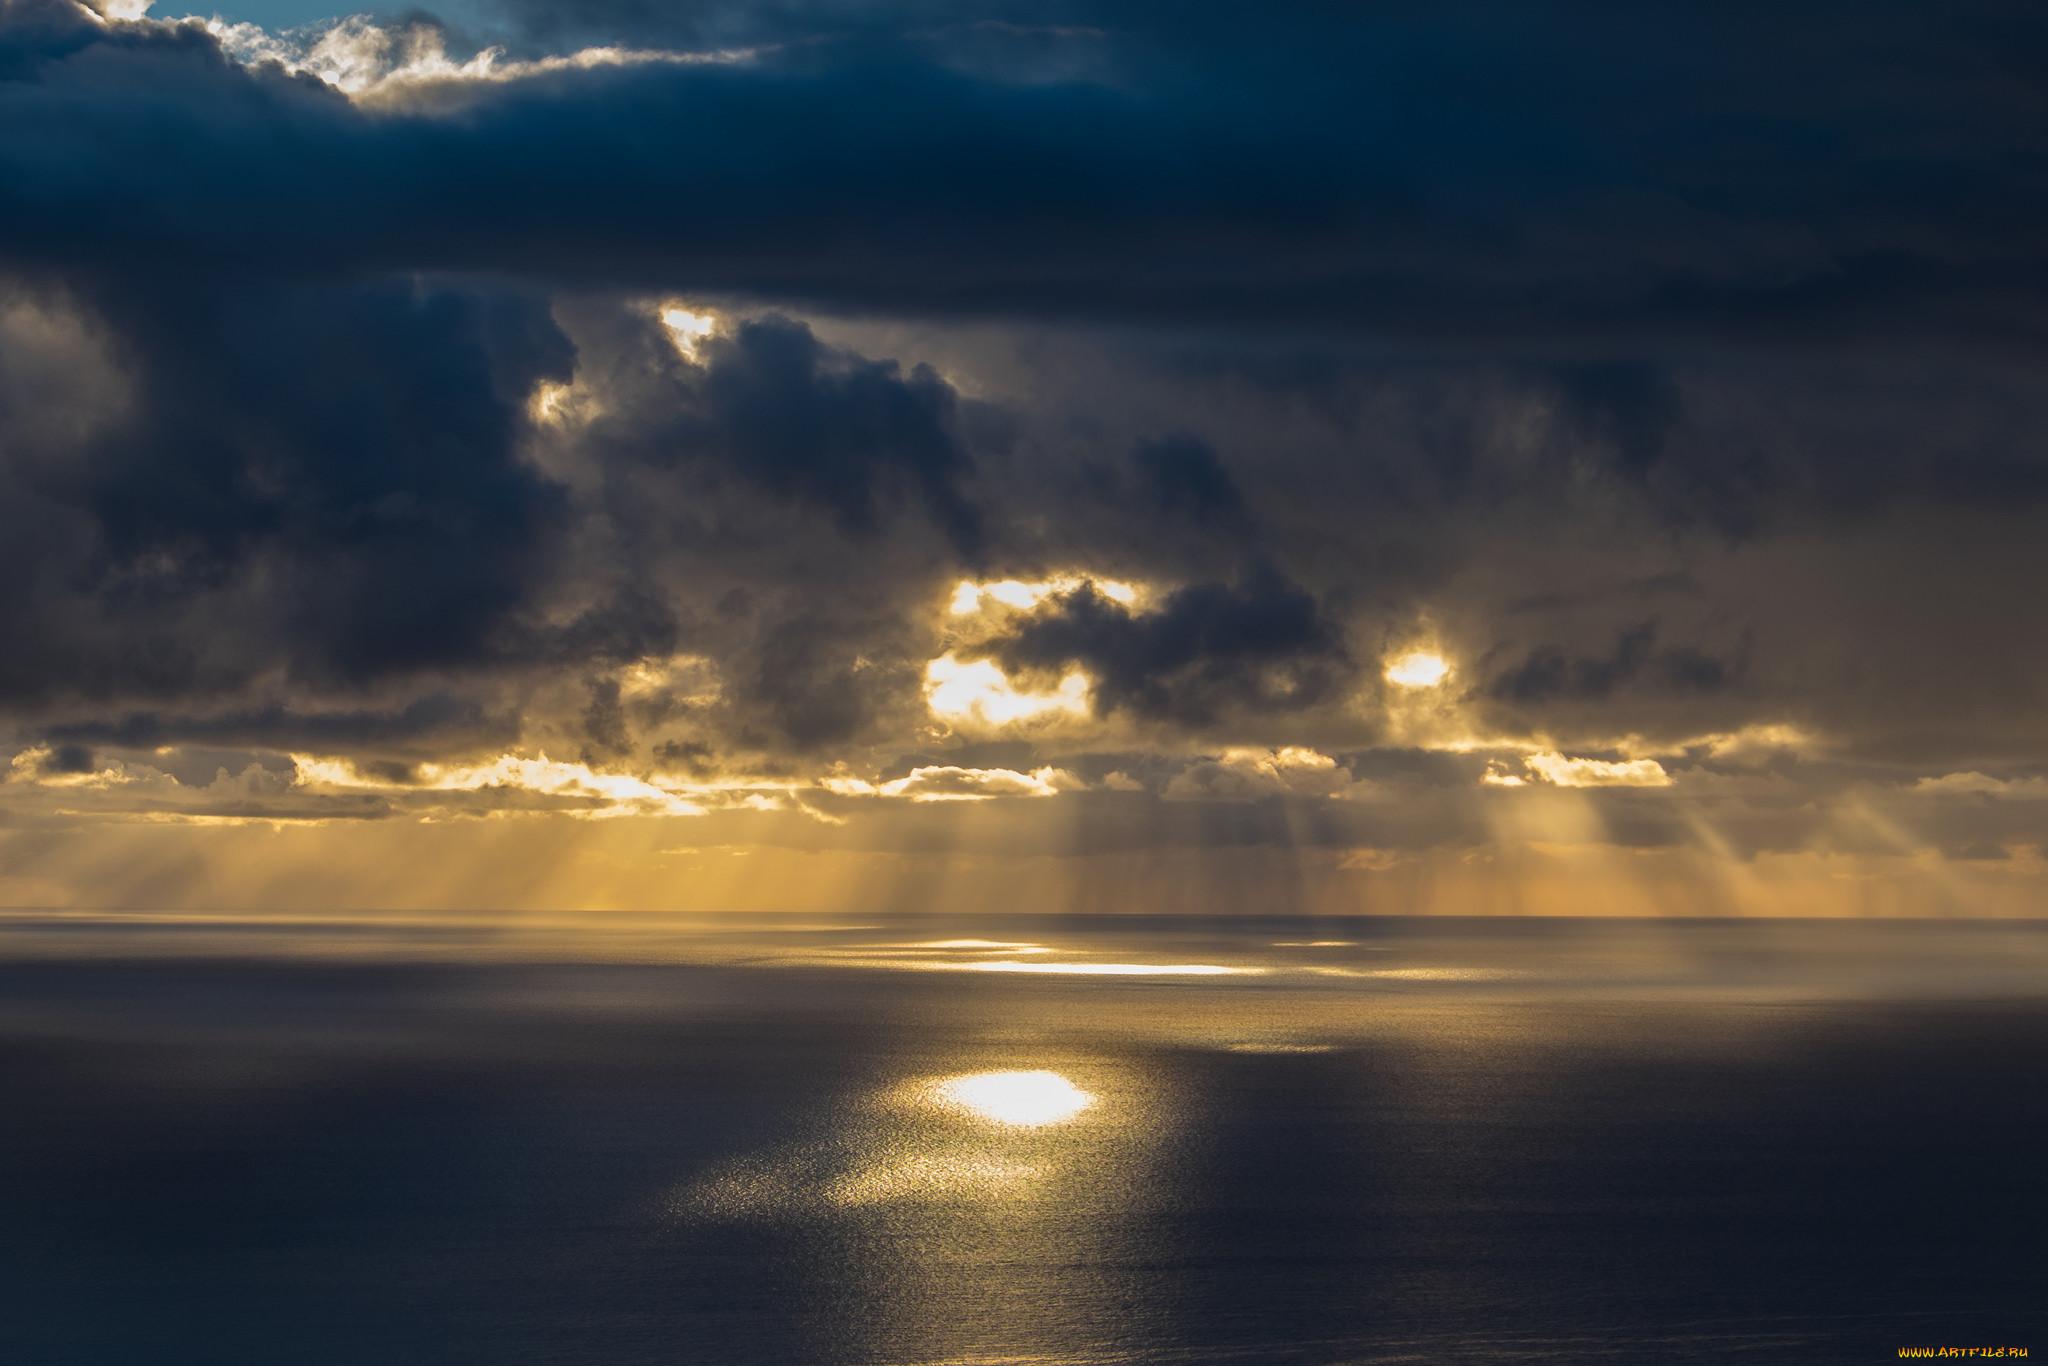 природа, моря, океаны, солнечные, лучи, тучи, море